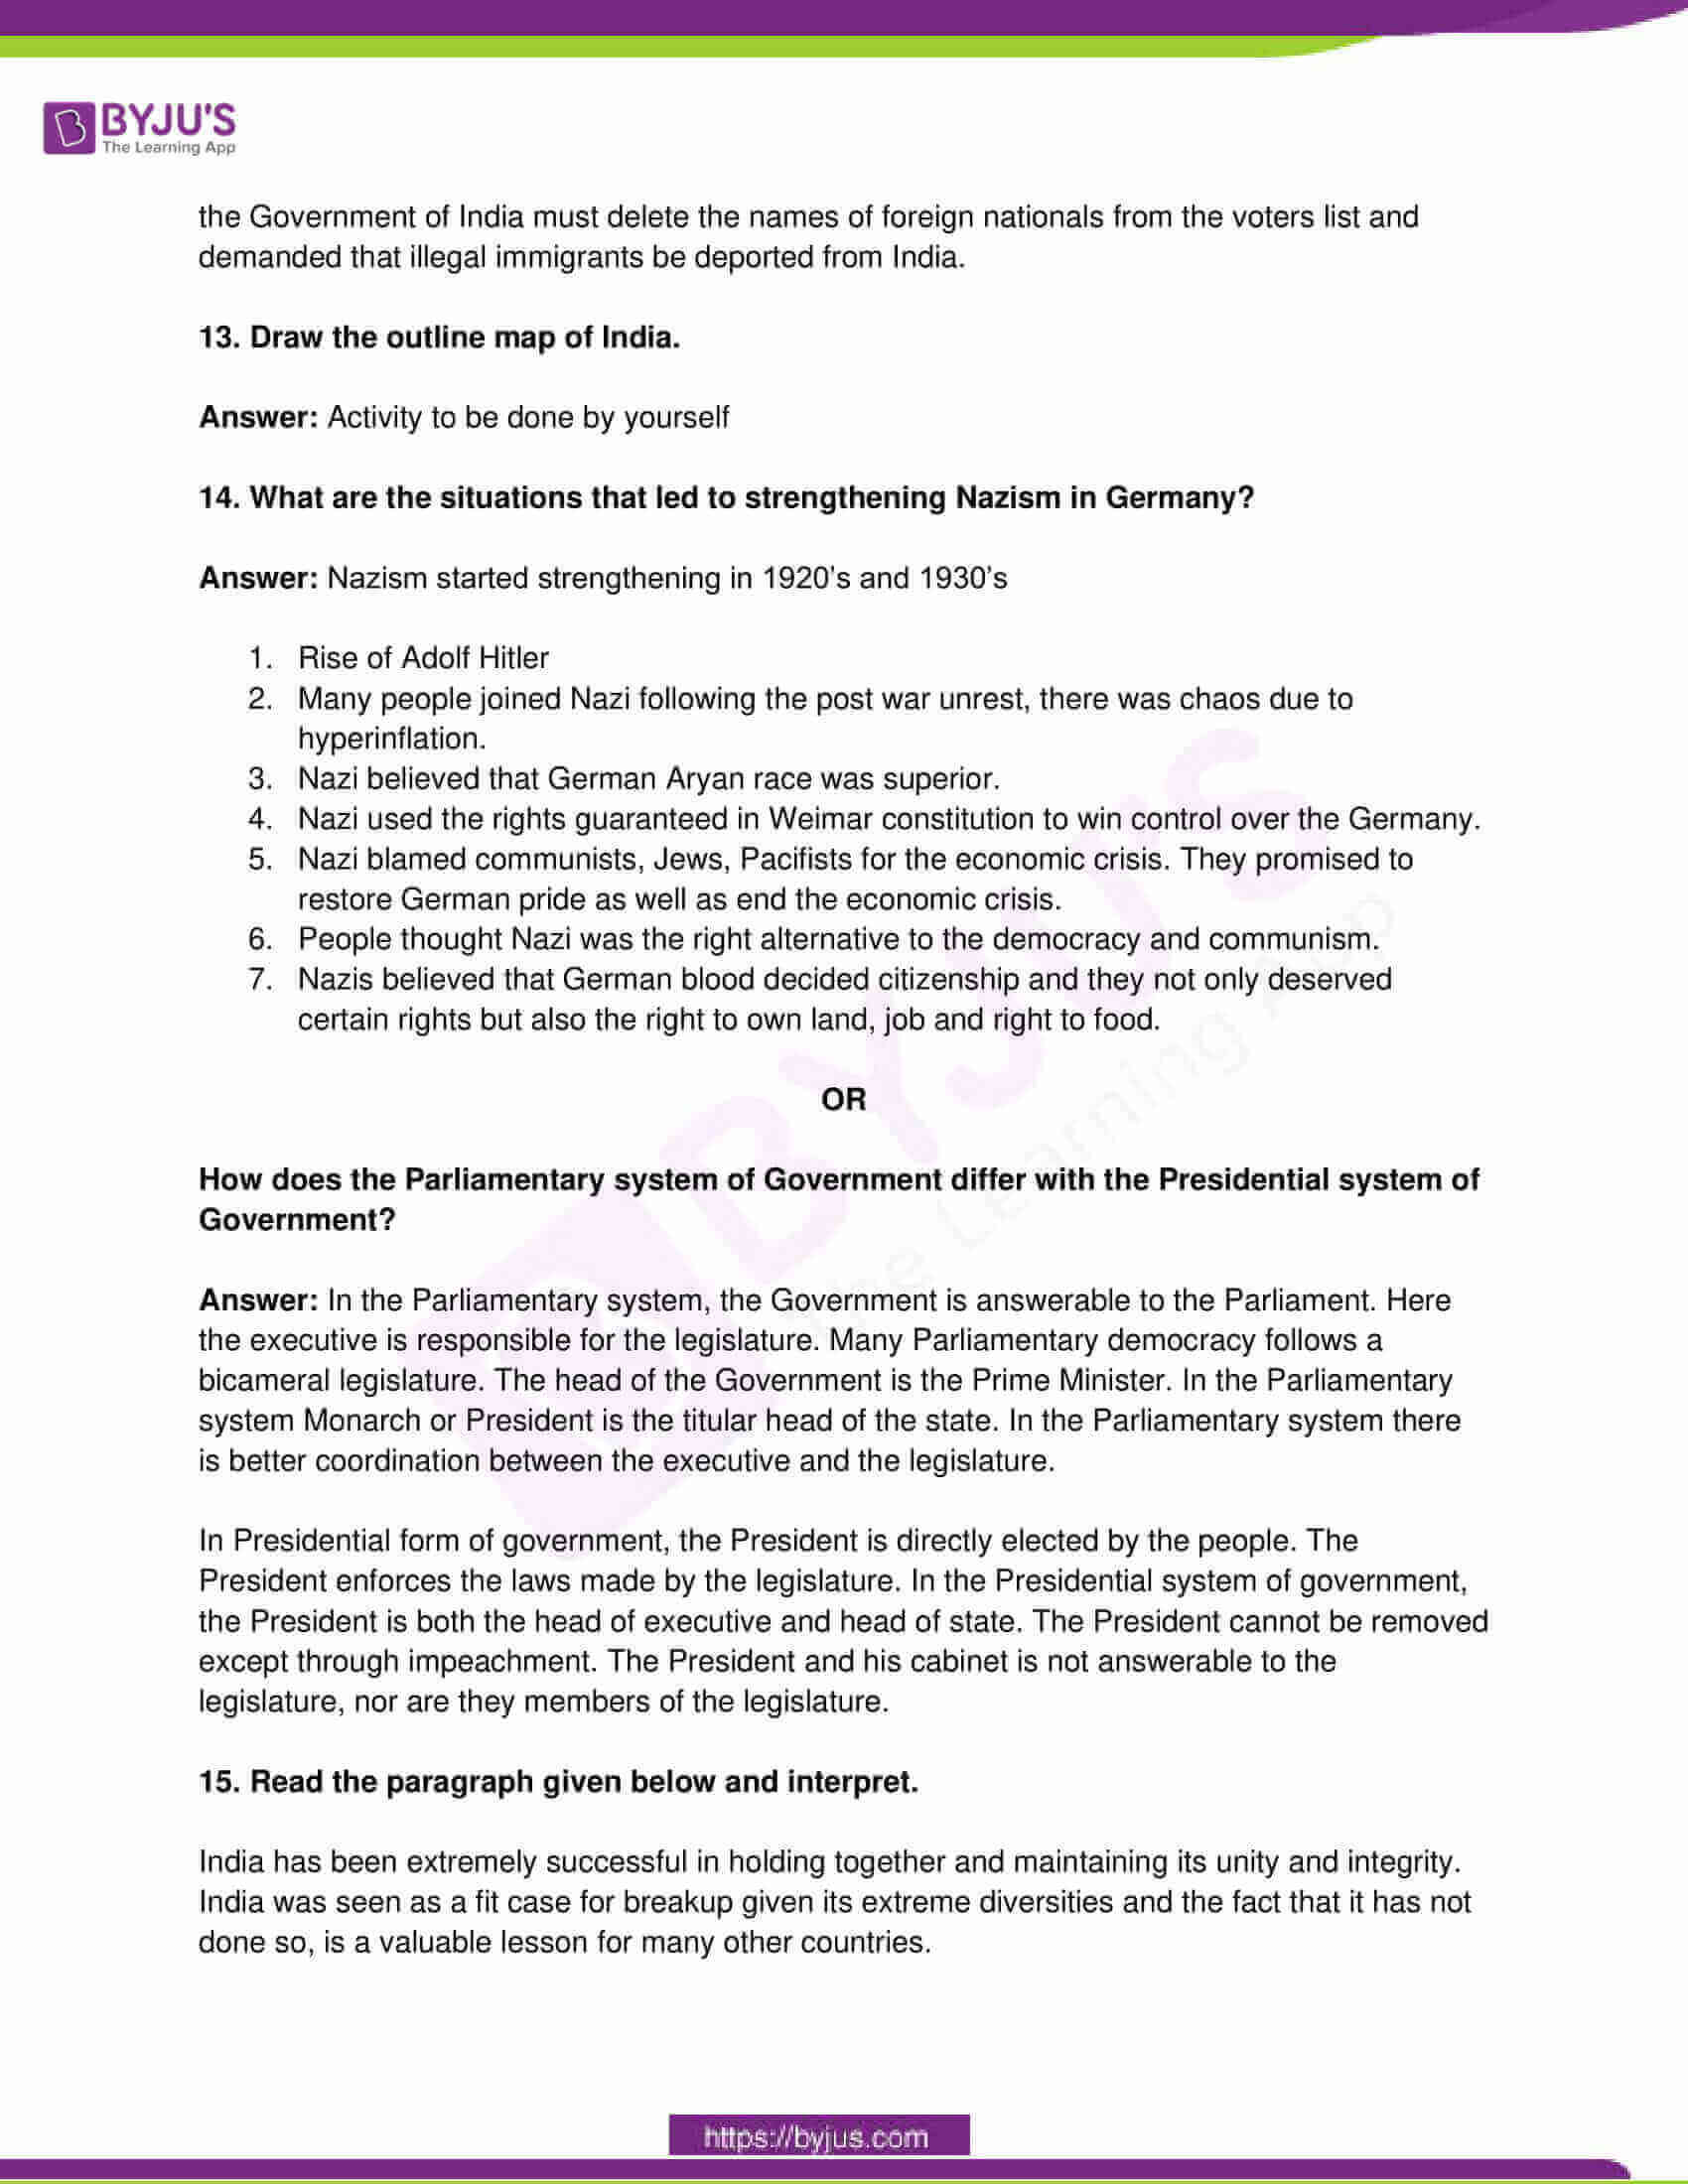 telangana board class 10 social science 2016 paper 2 solutions 4